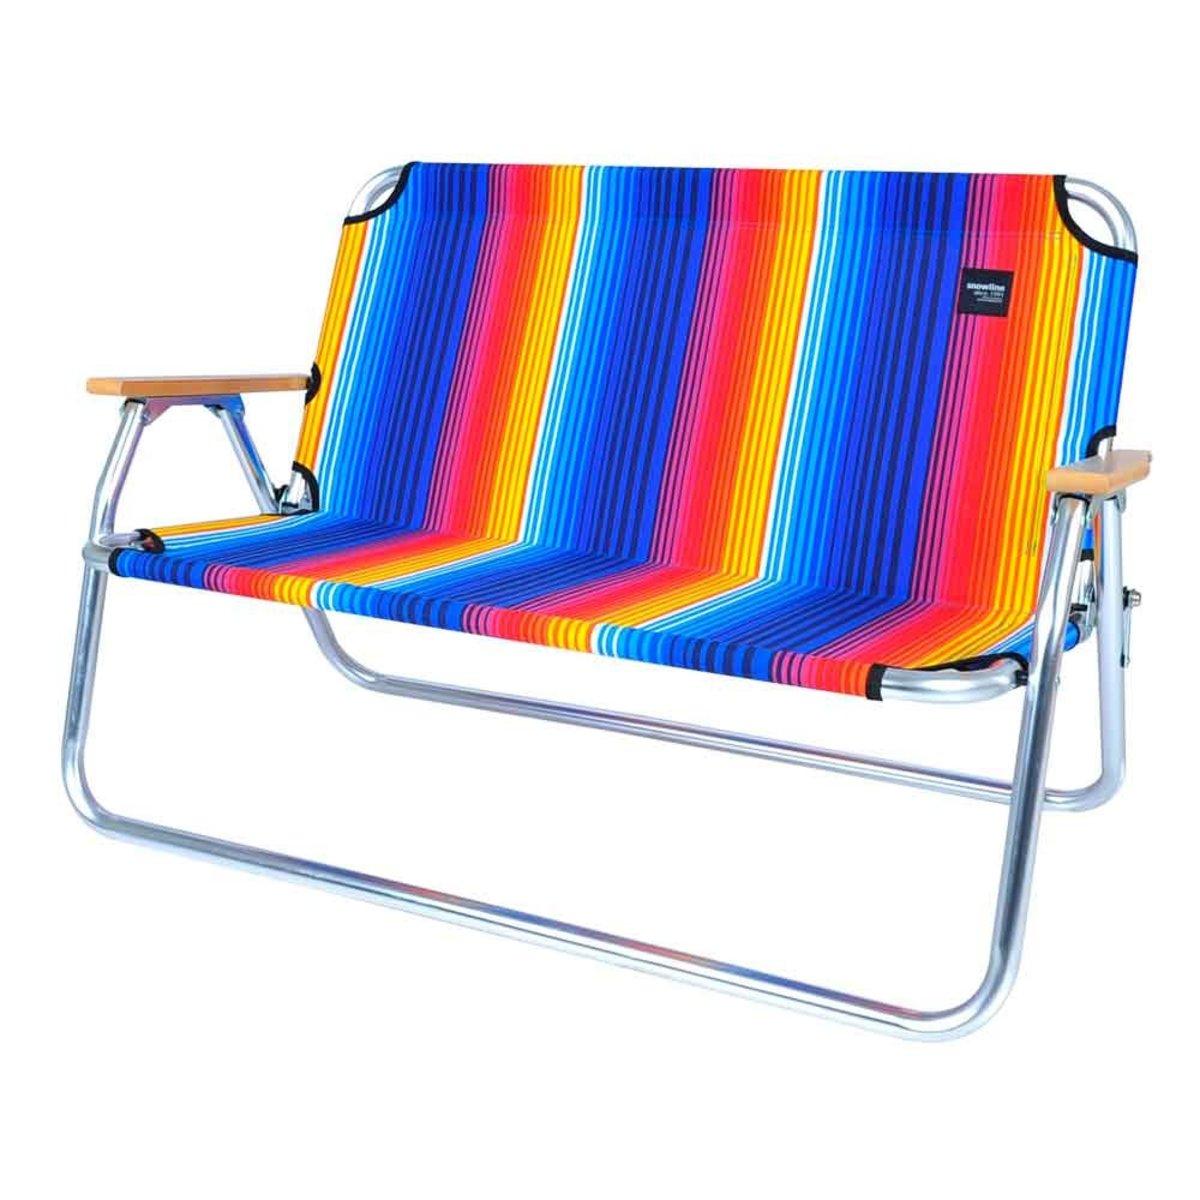 韓國露營椅 Folding Bench Rainbow